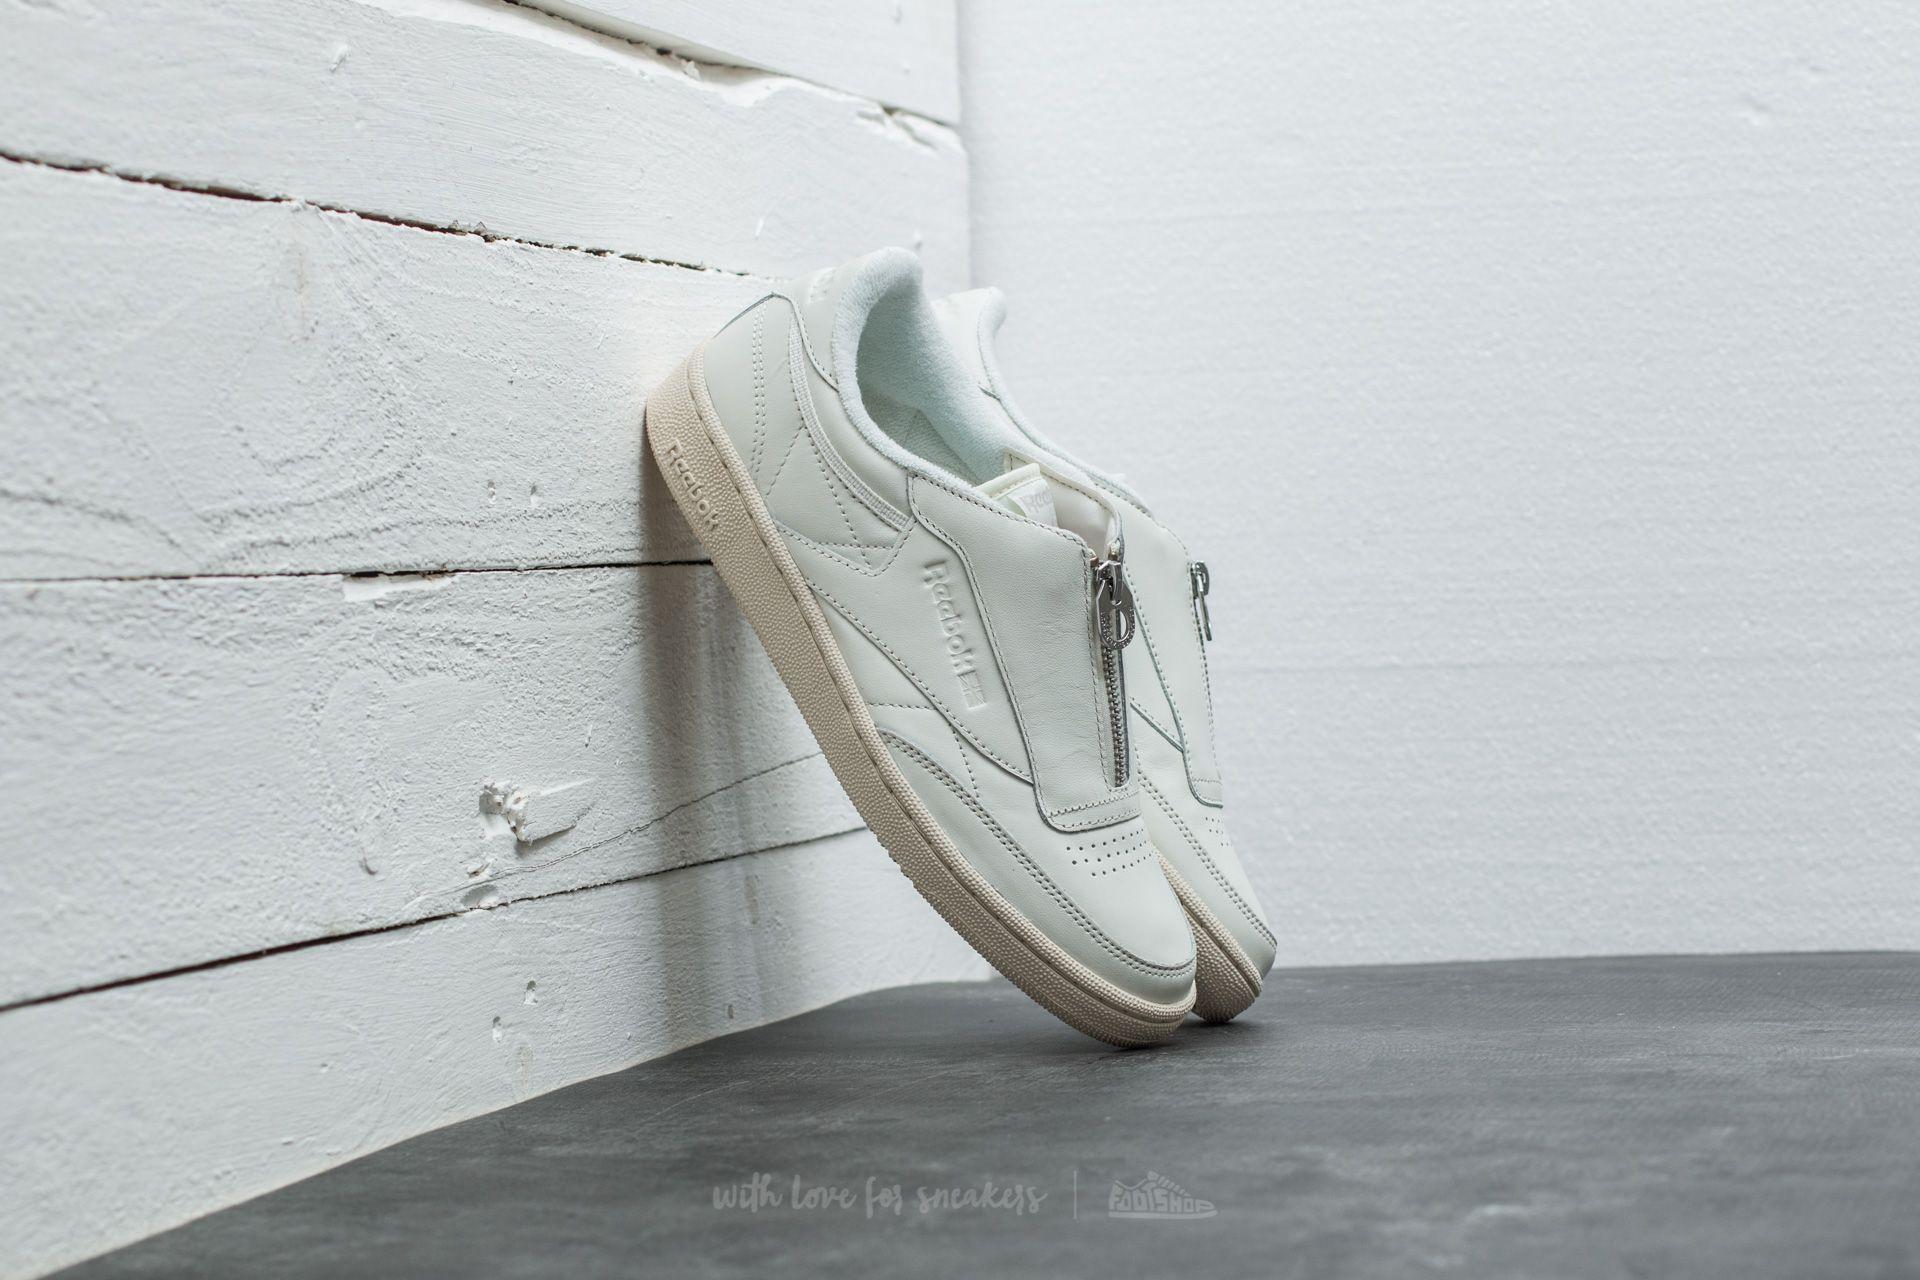 bde73c65d2f Reebok Club C 85 Zip Chalk  Sandstone  White  Silver